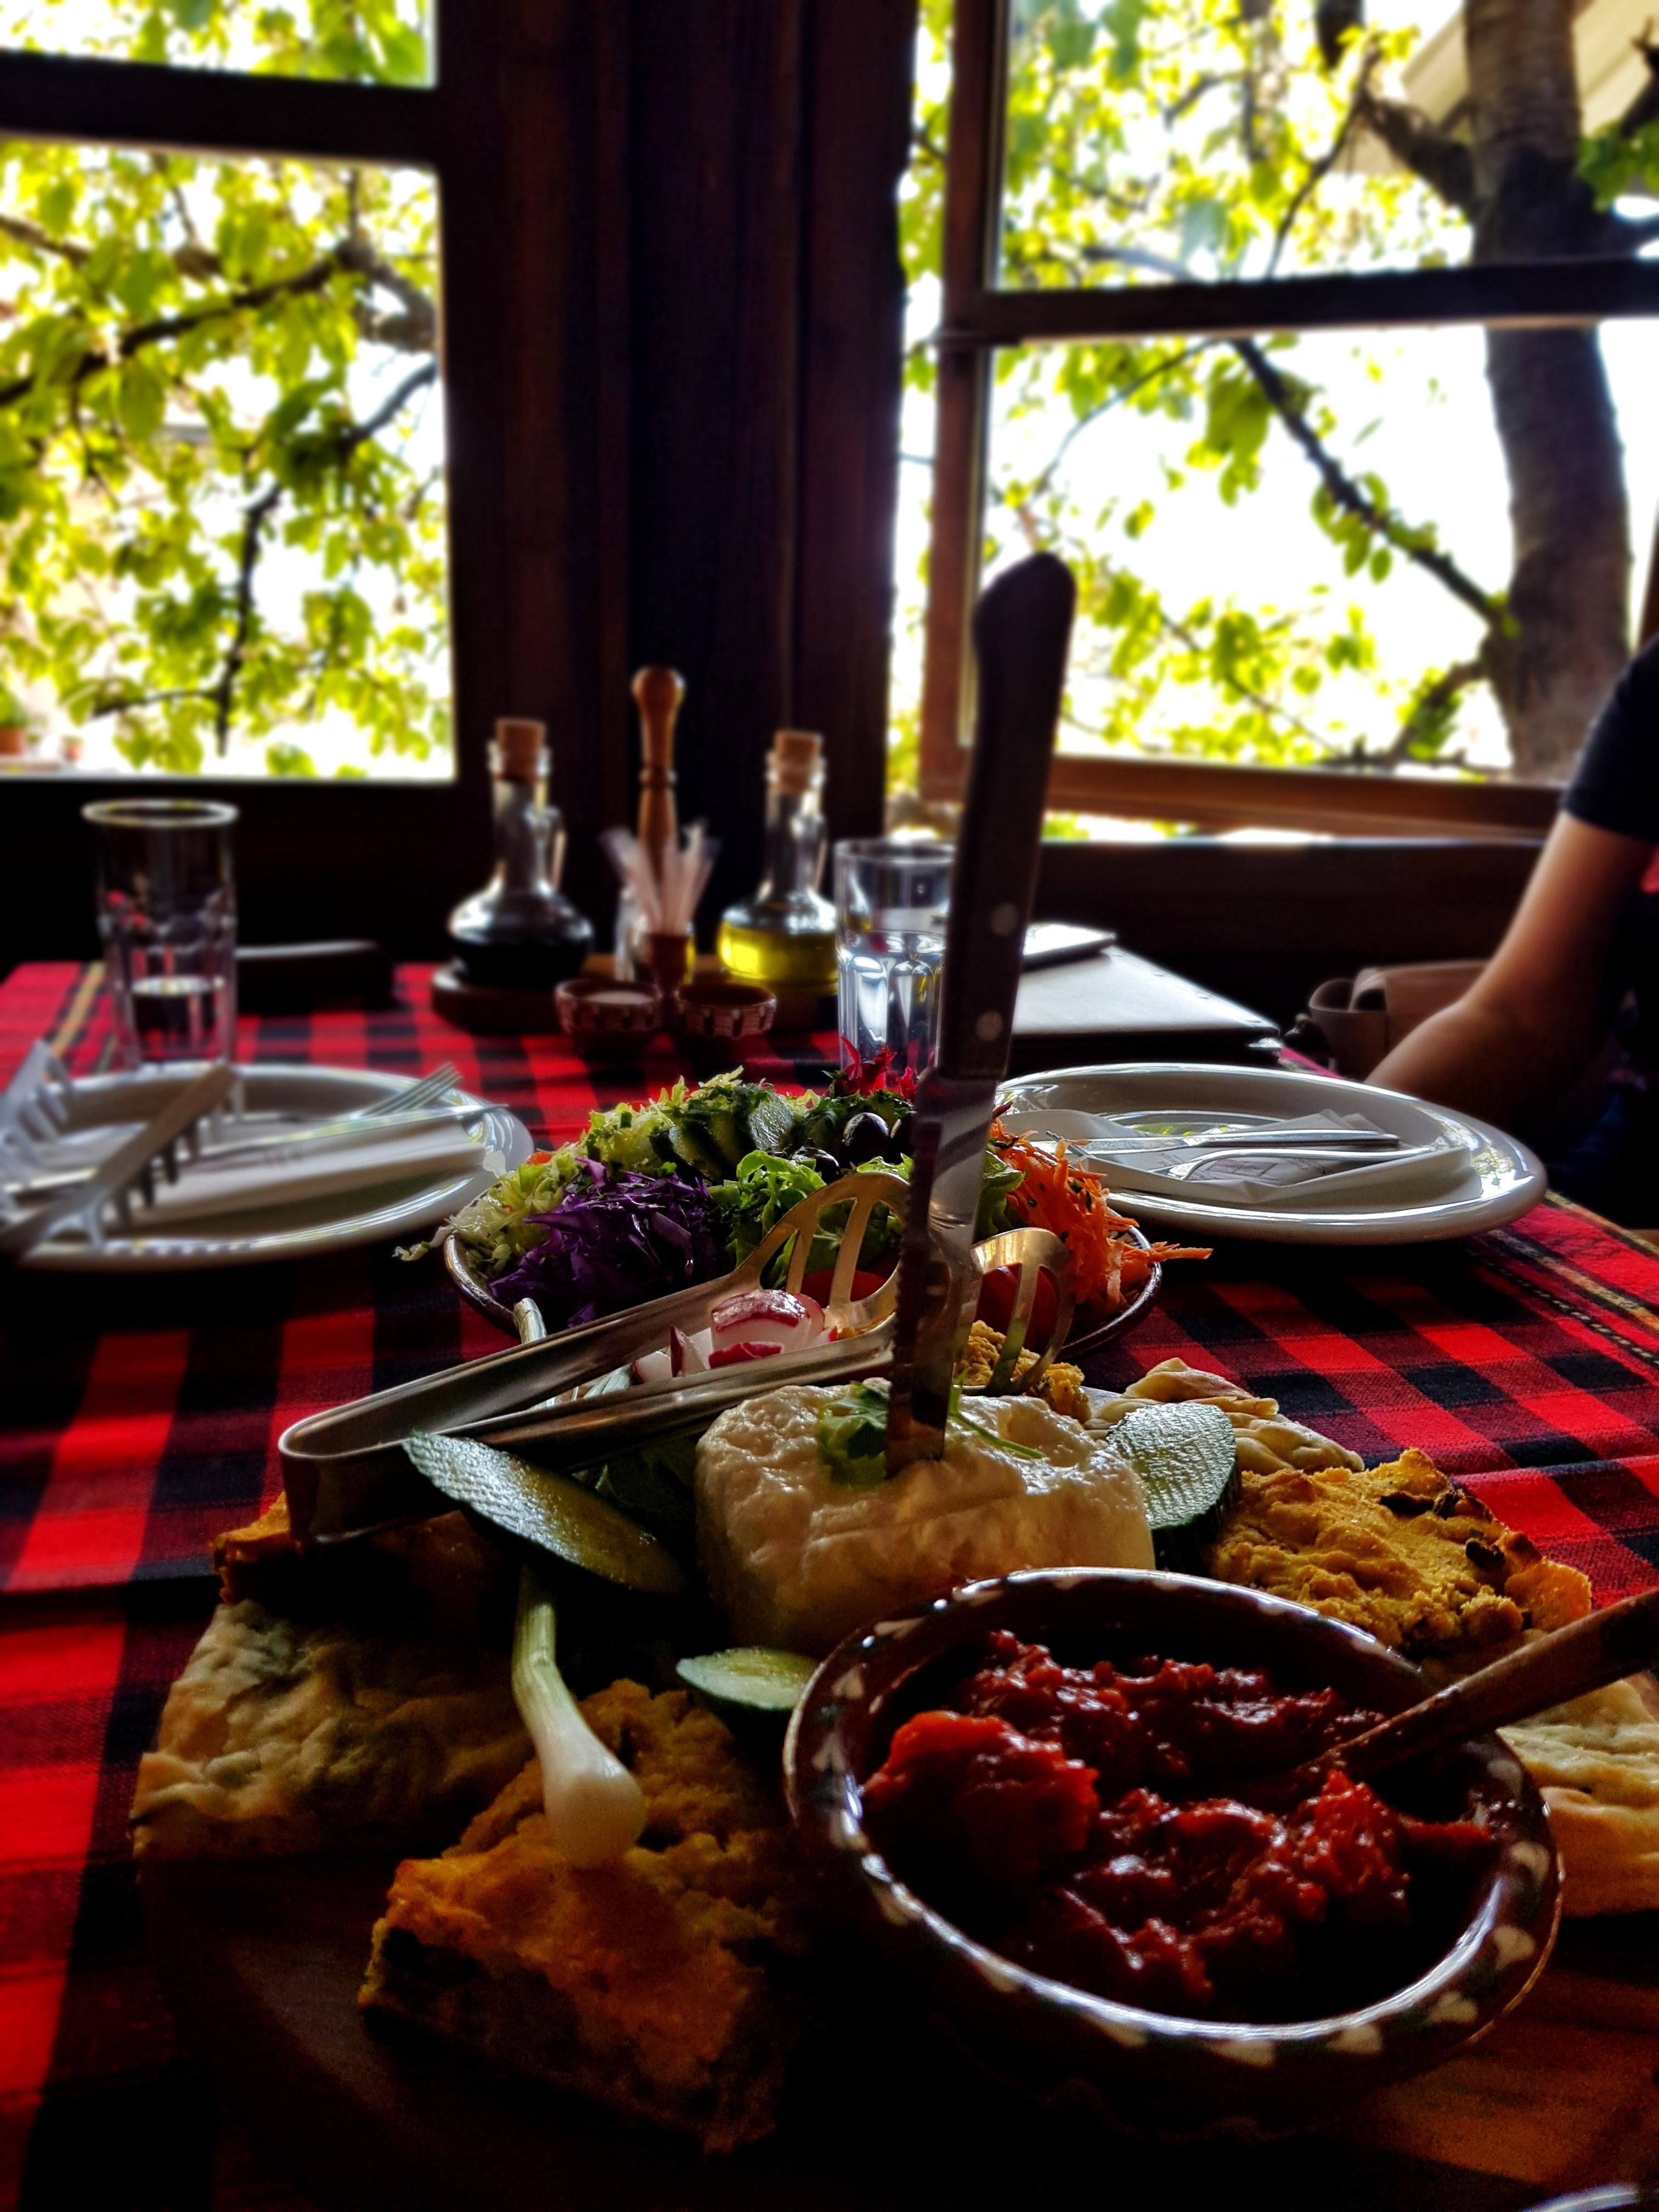 Macedonian_food_restaurant_kutmicevica_vevcani